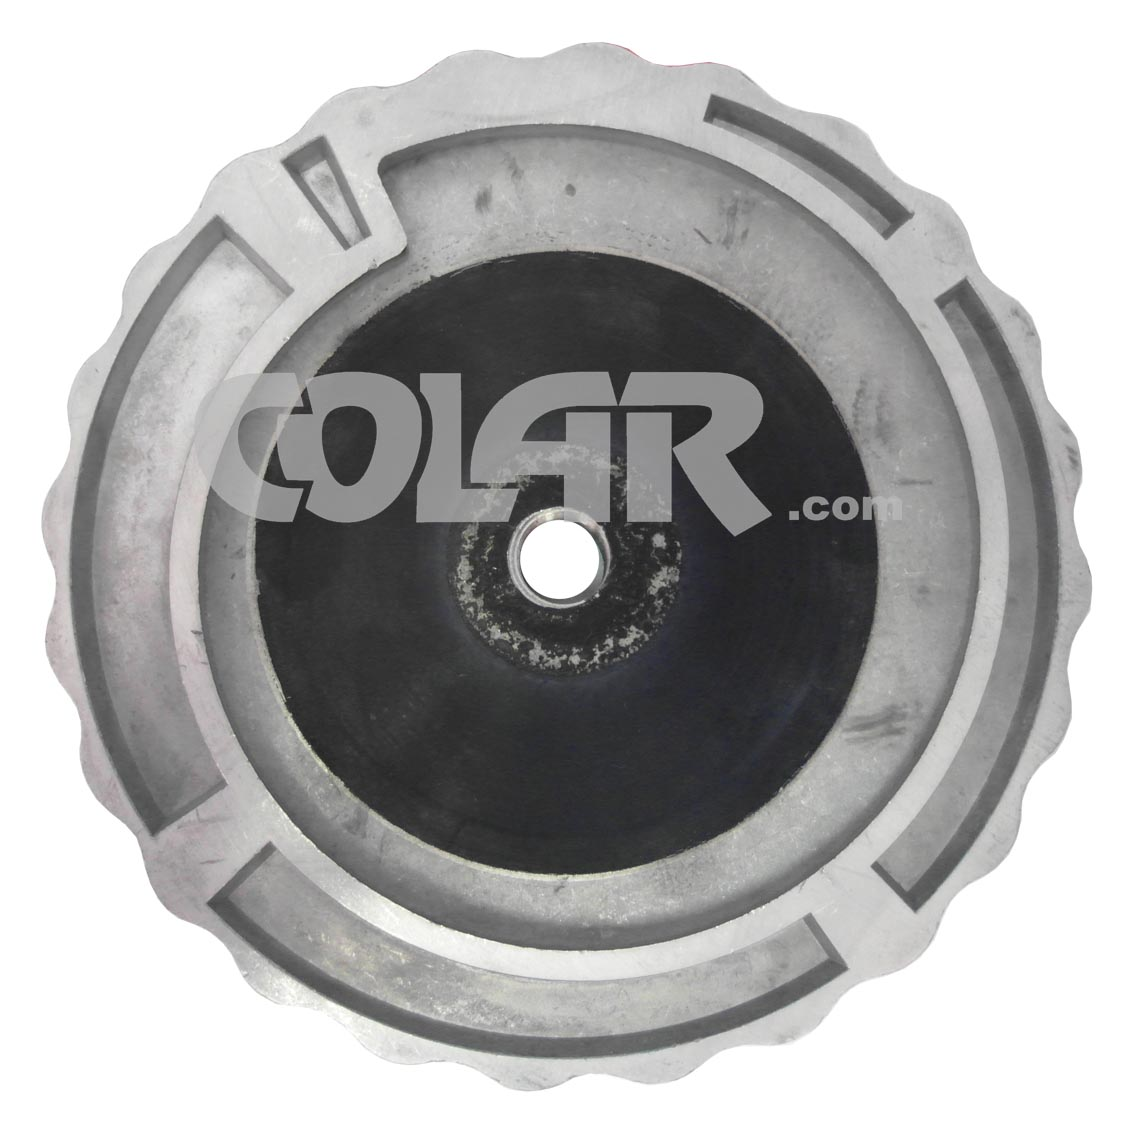 Suporte Para Rebolo Caracol 130mm  - COLAR